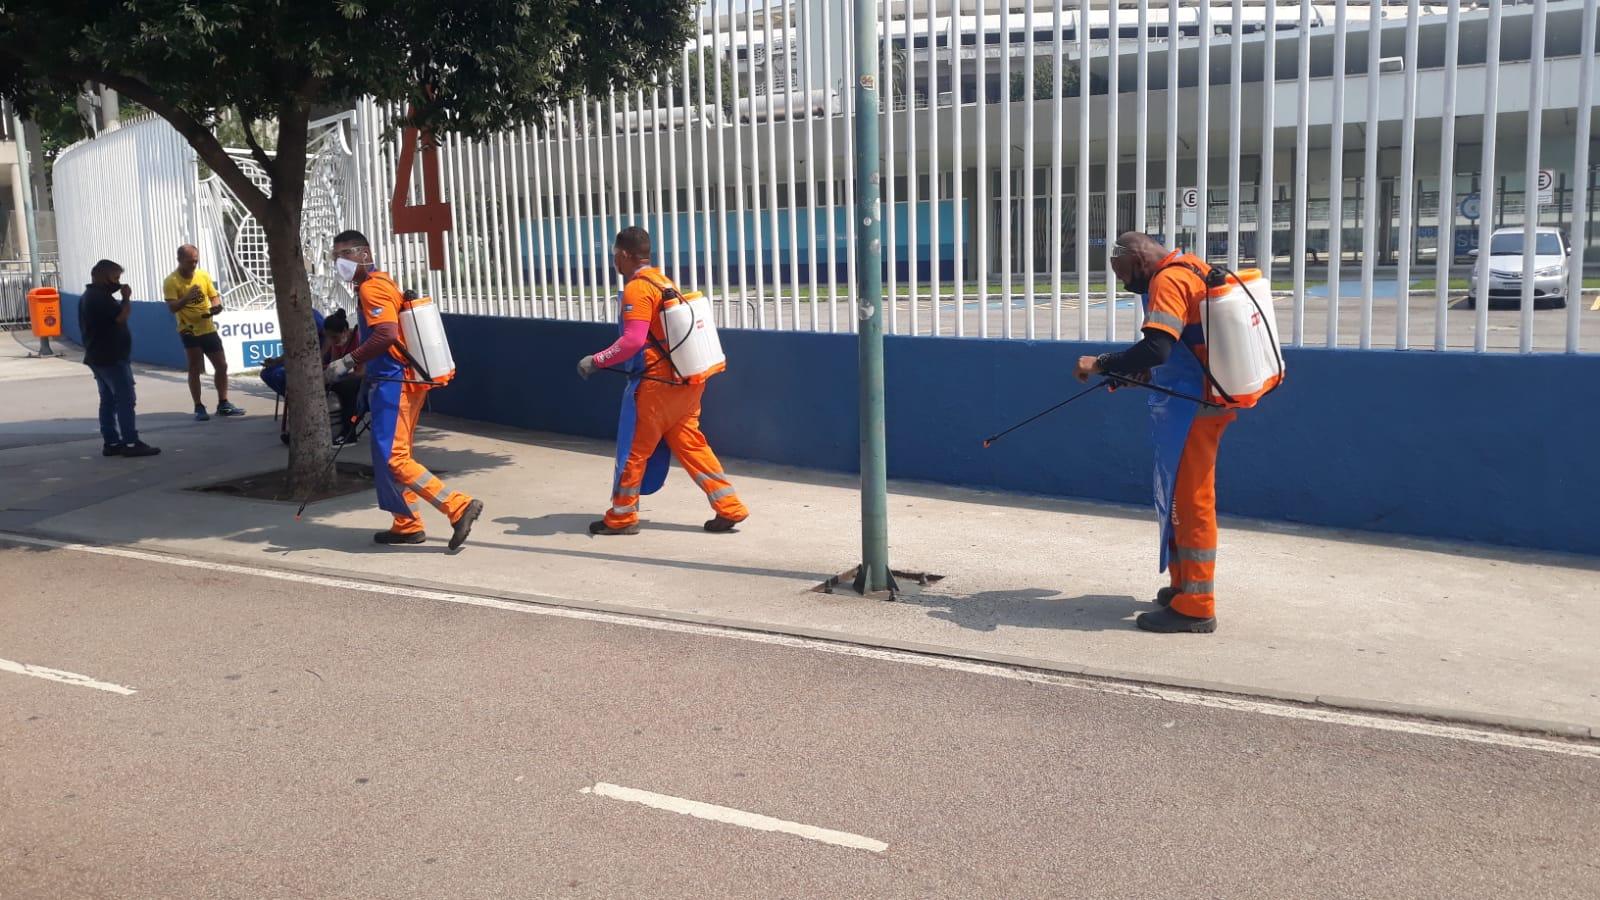 Garis higienizando entorno do Maracanã